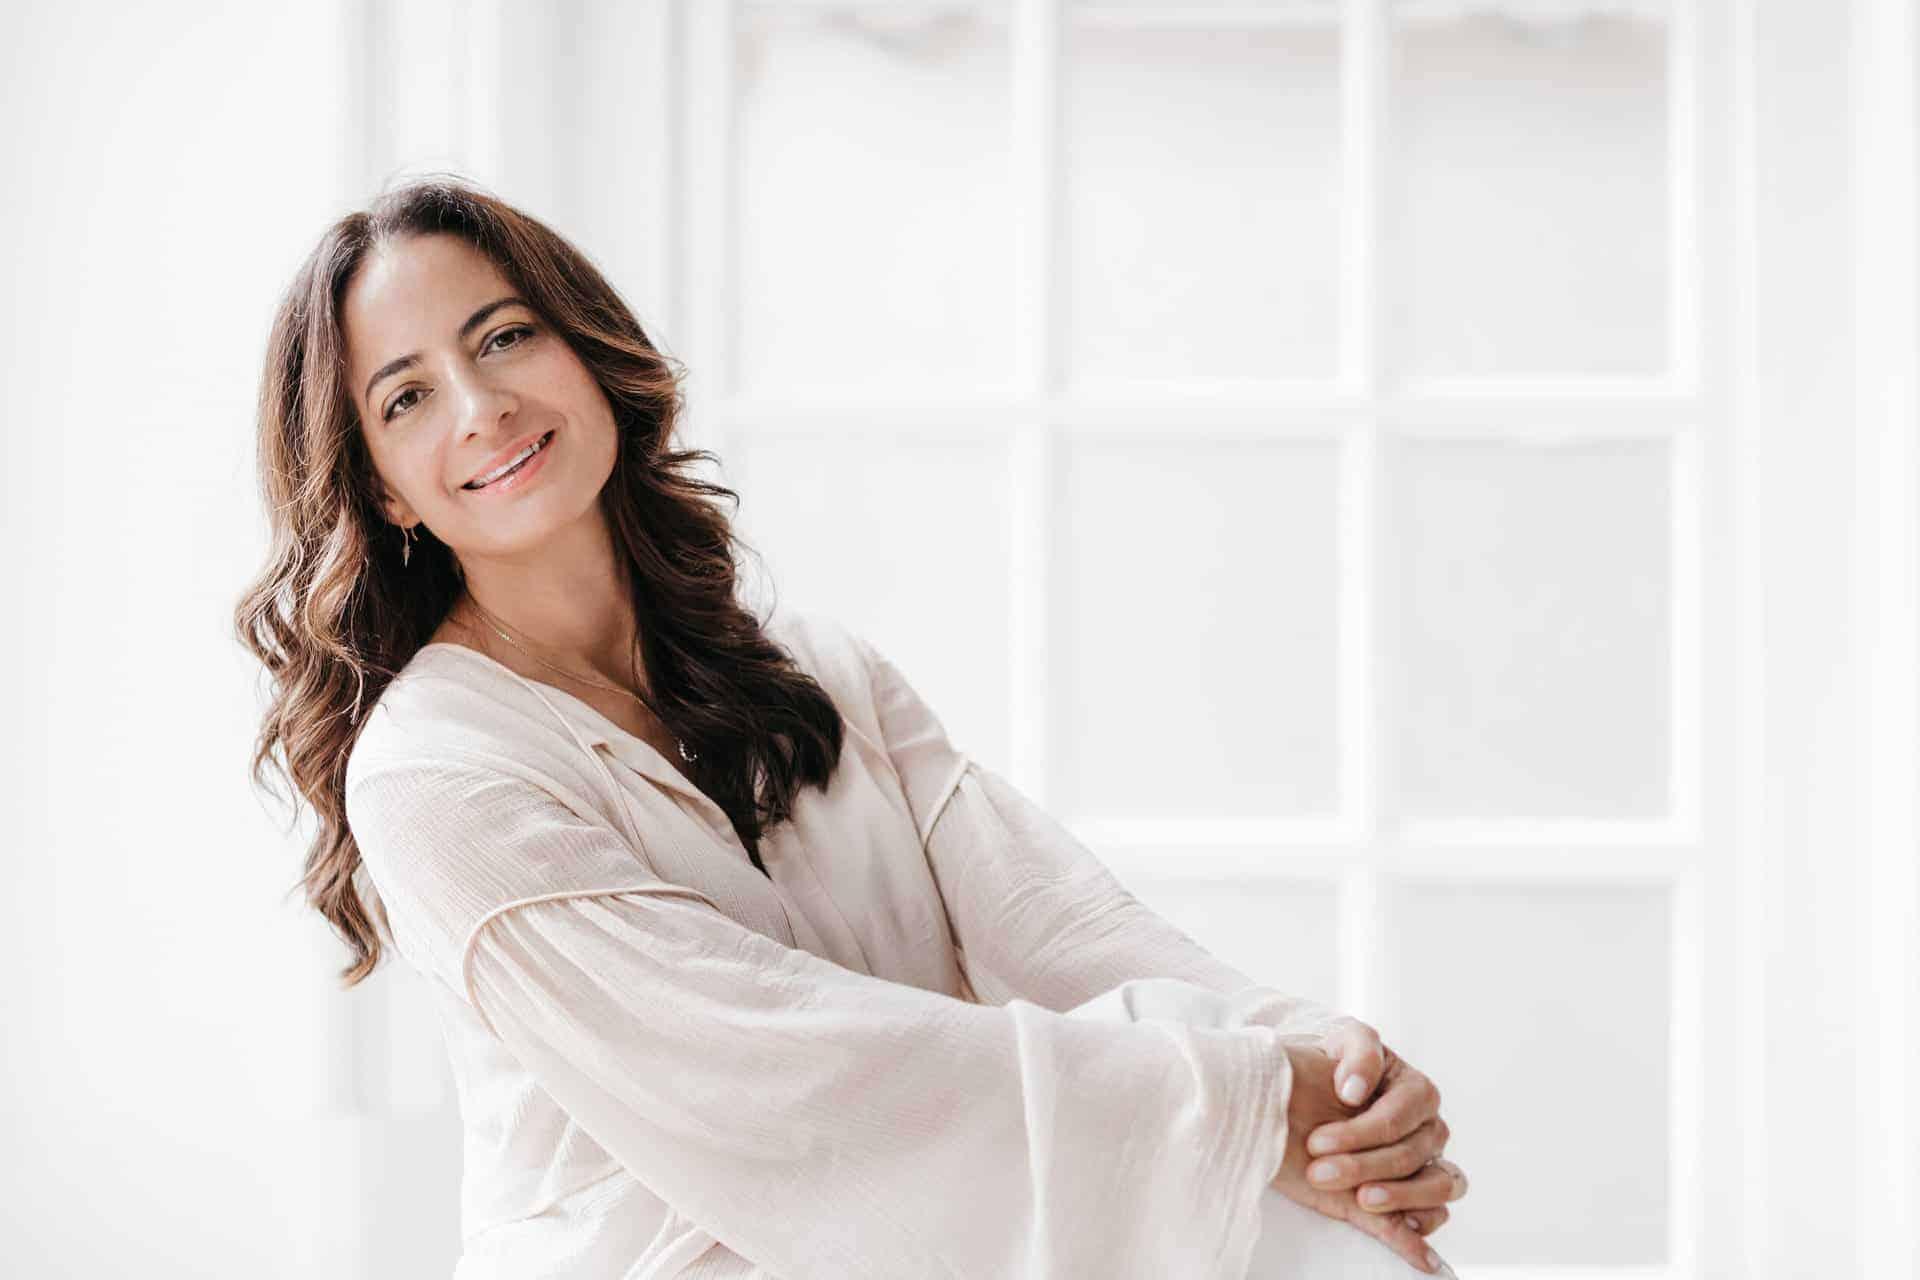 Work & Wellbeing with Gabriella Espinosa